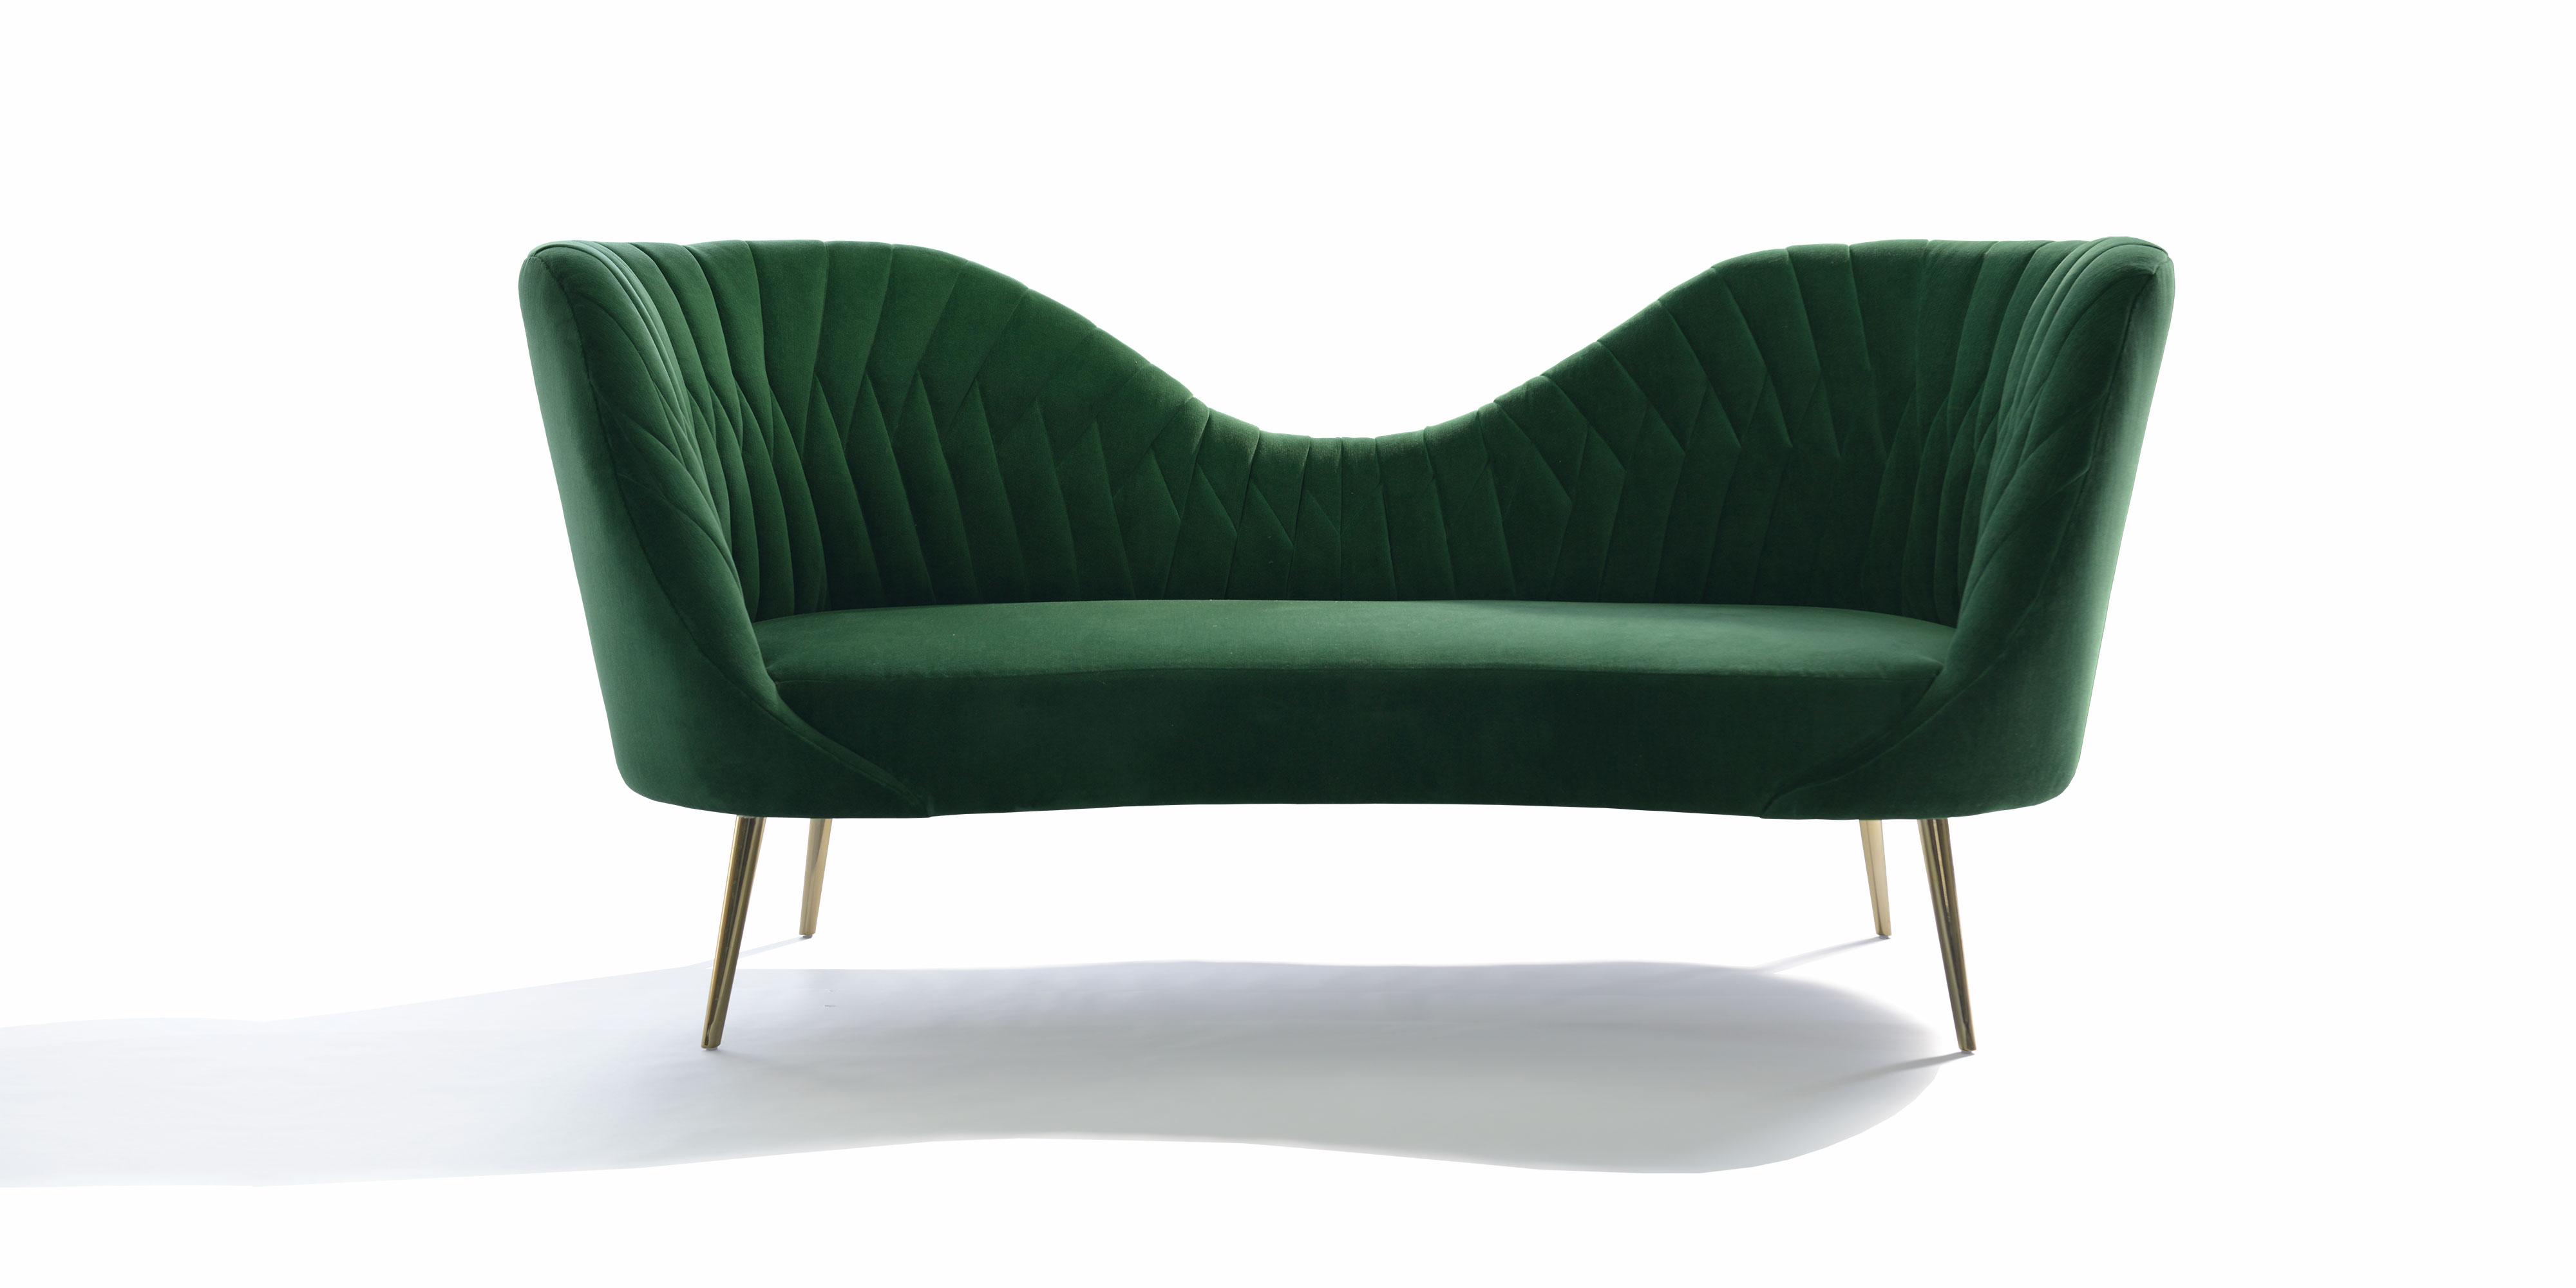 Nathan Anthony Minx Wing sofa